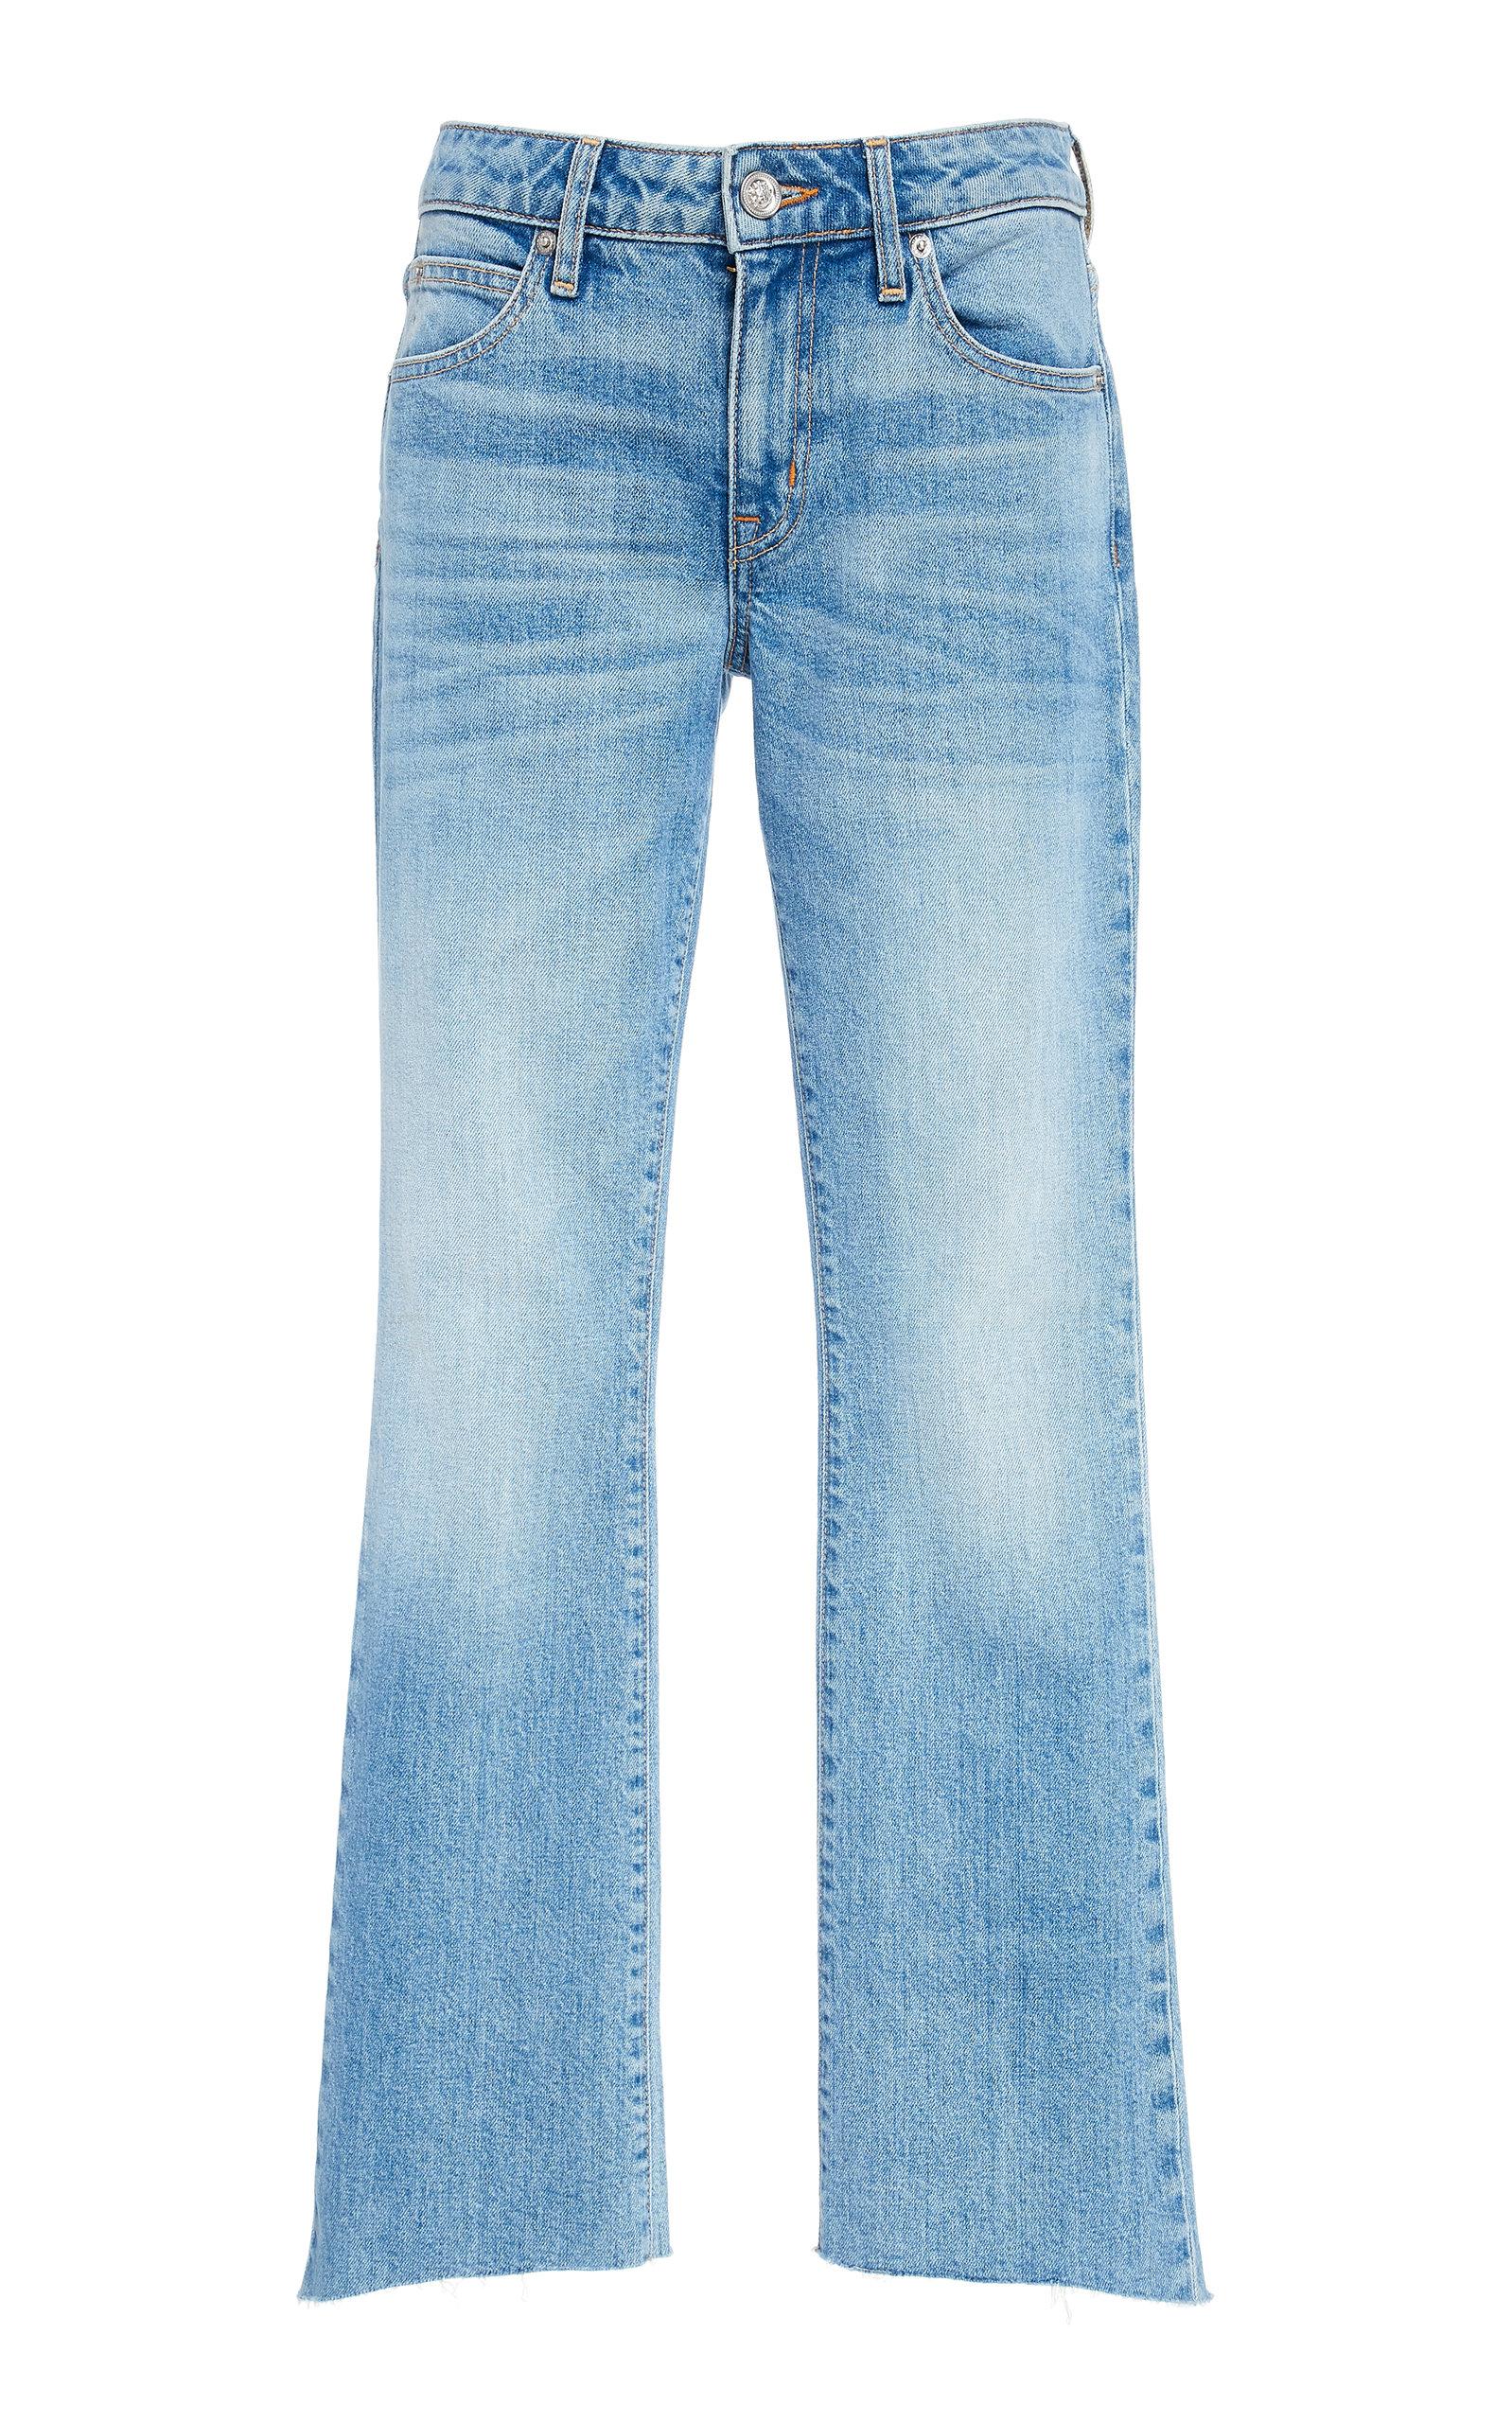 SLVRLAKE DENIM Scarlett Mid-Rise Slim Flared Jeans in Light Wash